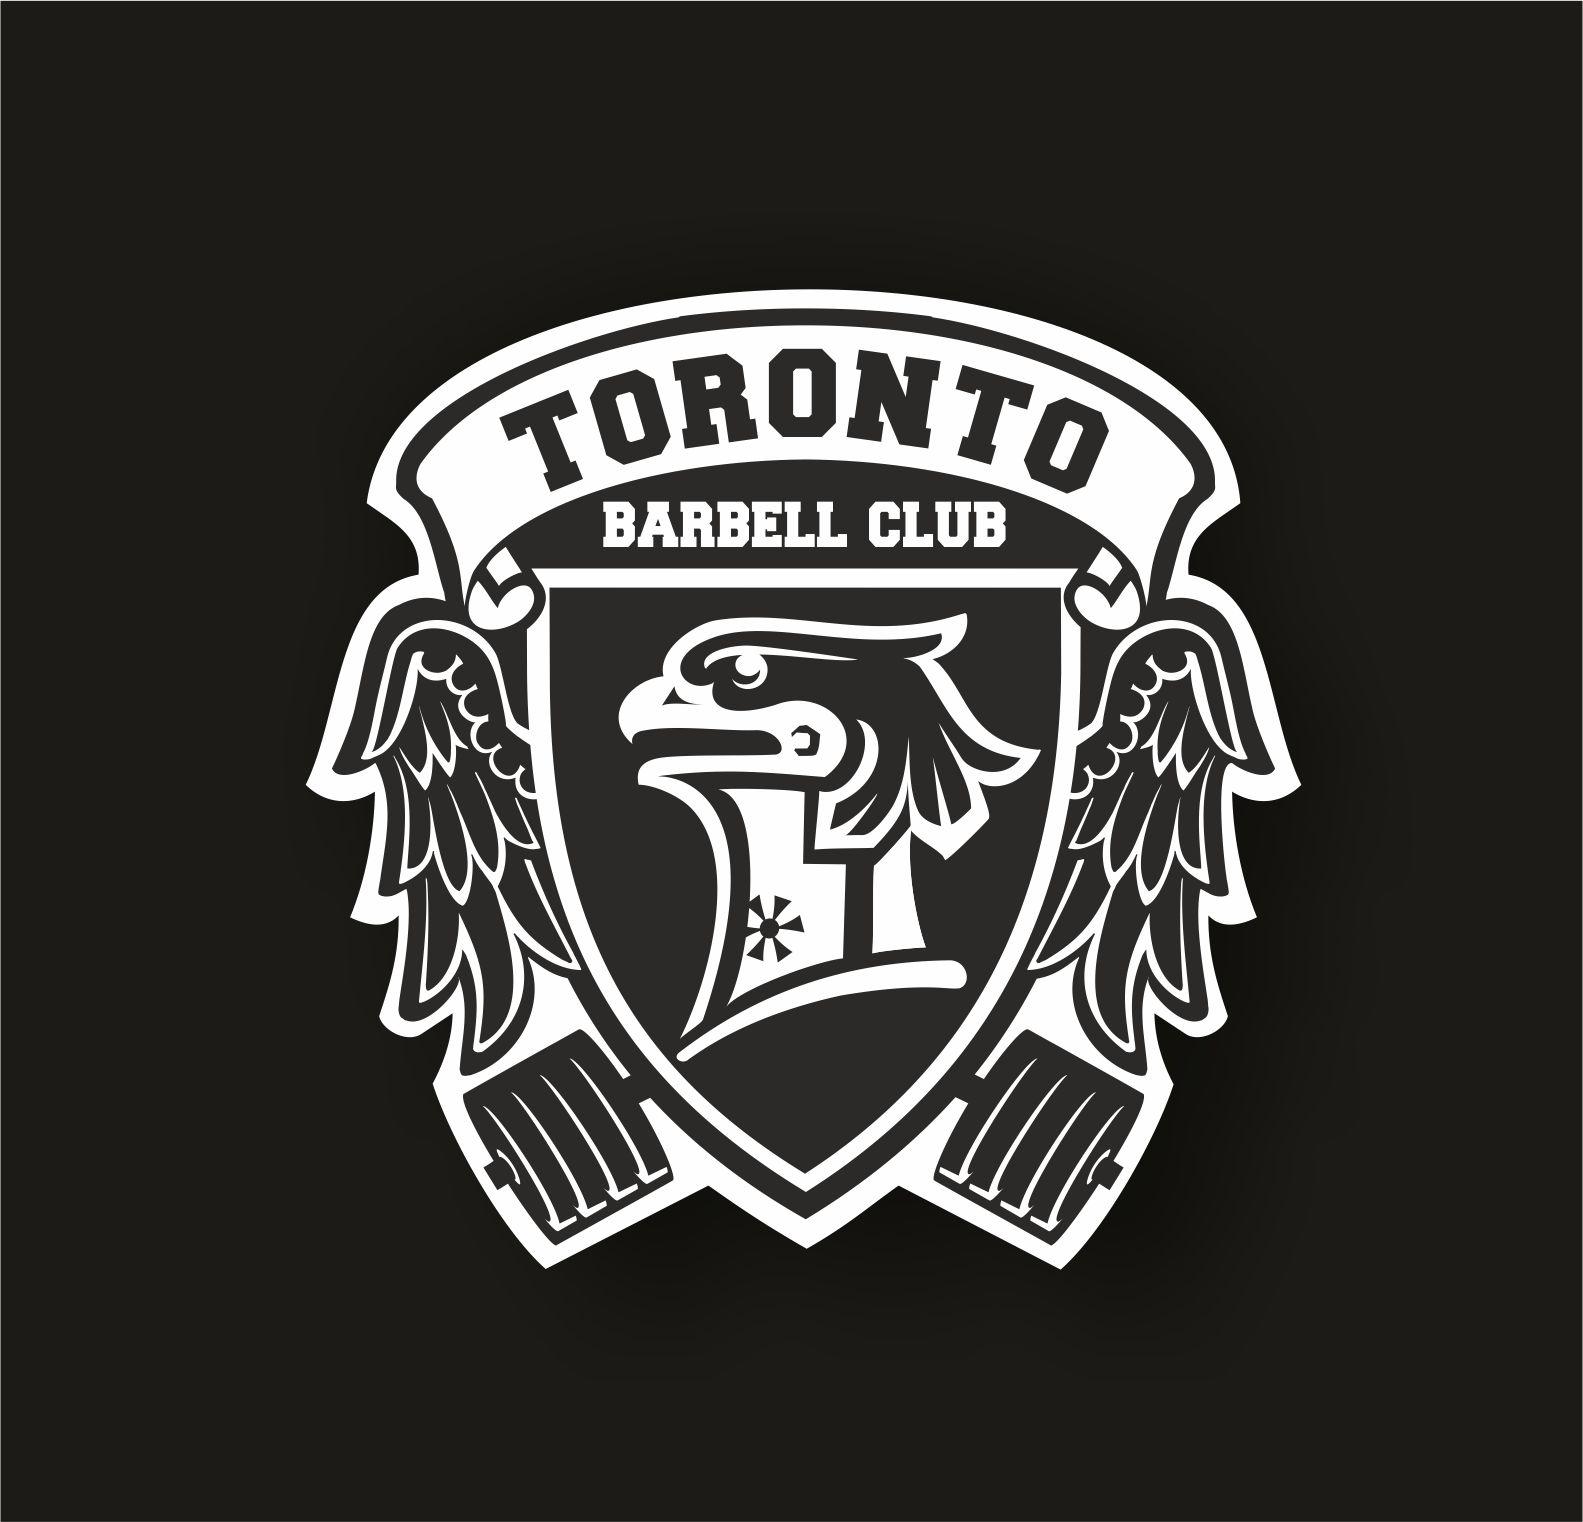 Eagle helmet logo crest.   Logotip u obliku grba s prikazom orla i kacige.